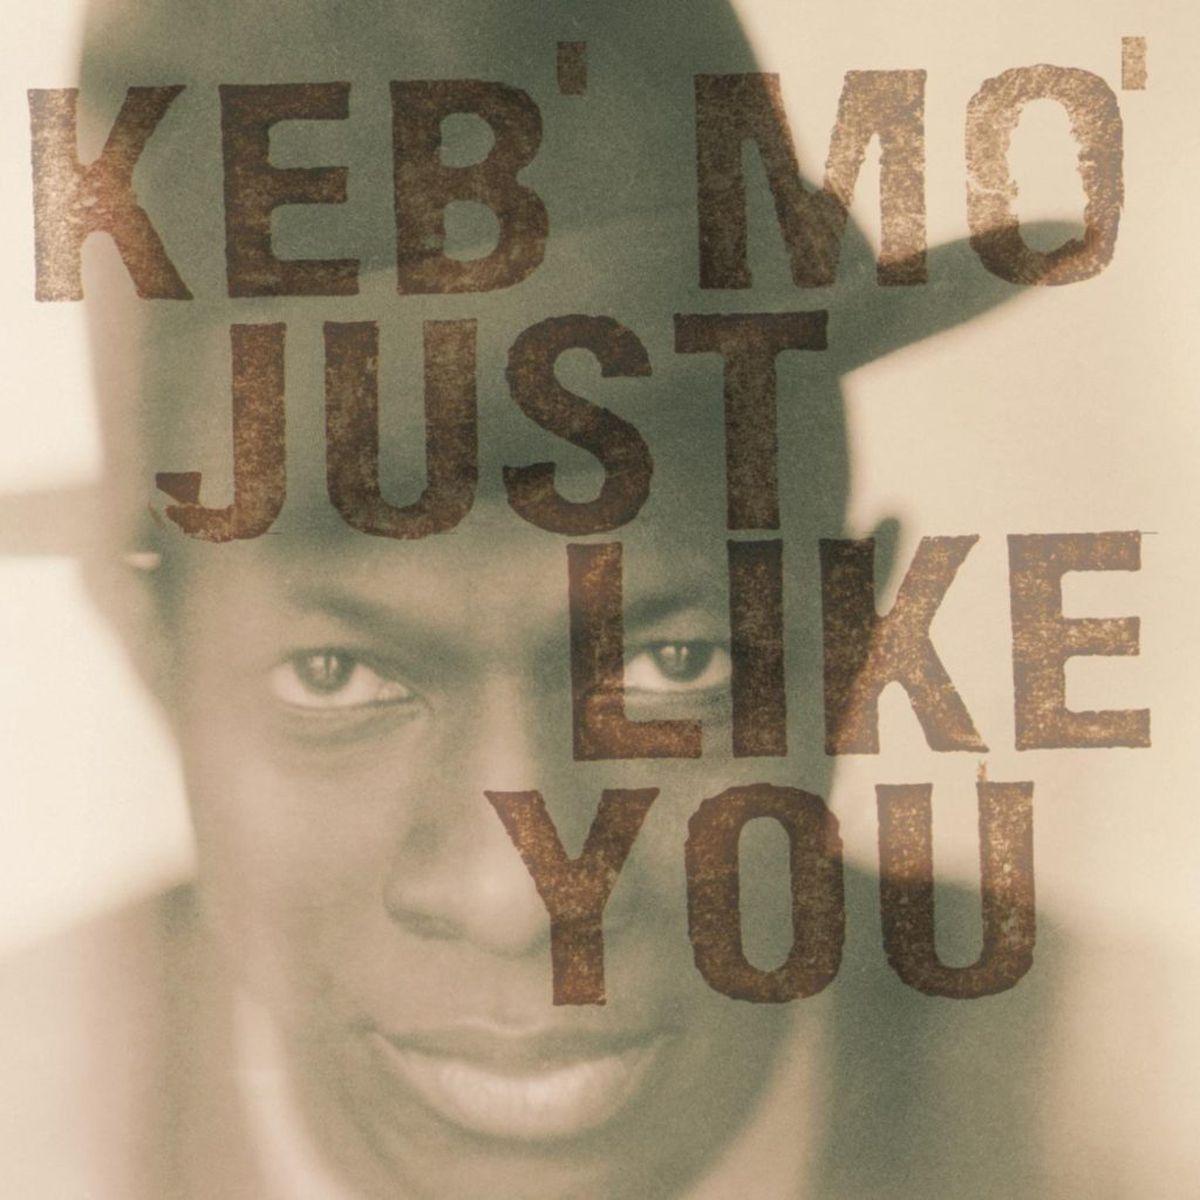 купить Кеб Мо Keb'mo'. Just Like You (LP) дешево